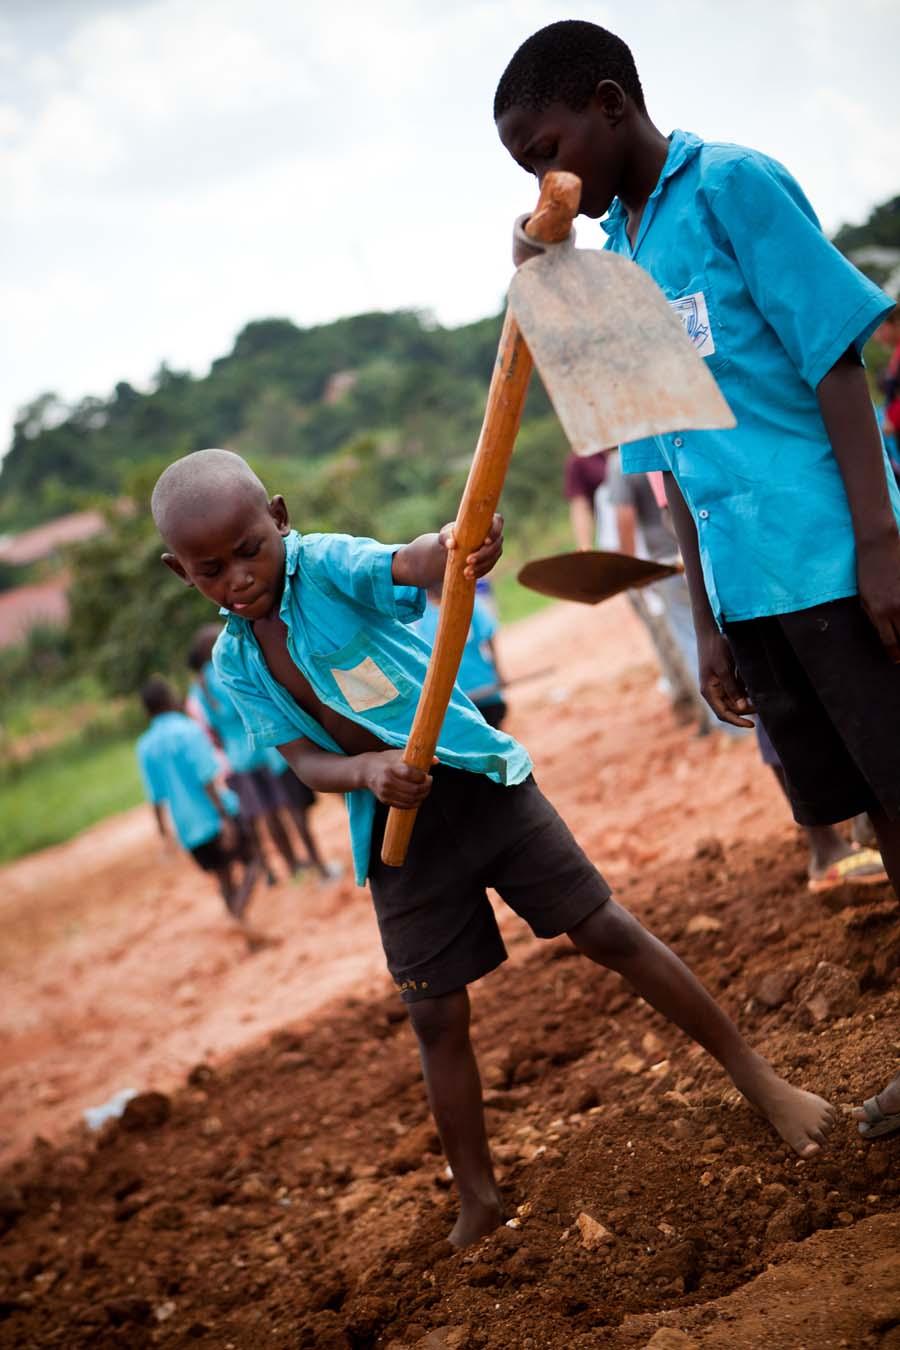 jessicadavisphotography.com | Jessica Davis Photography | Portrait Work in Uganda| Travel Photographer | World Event Photographs 4 (2).jpg